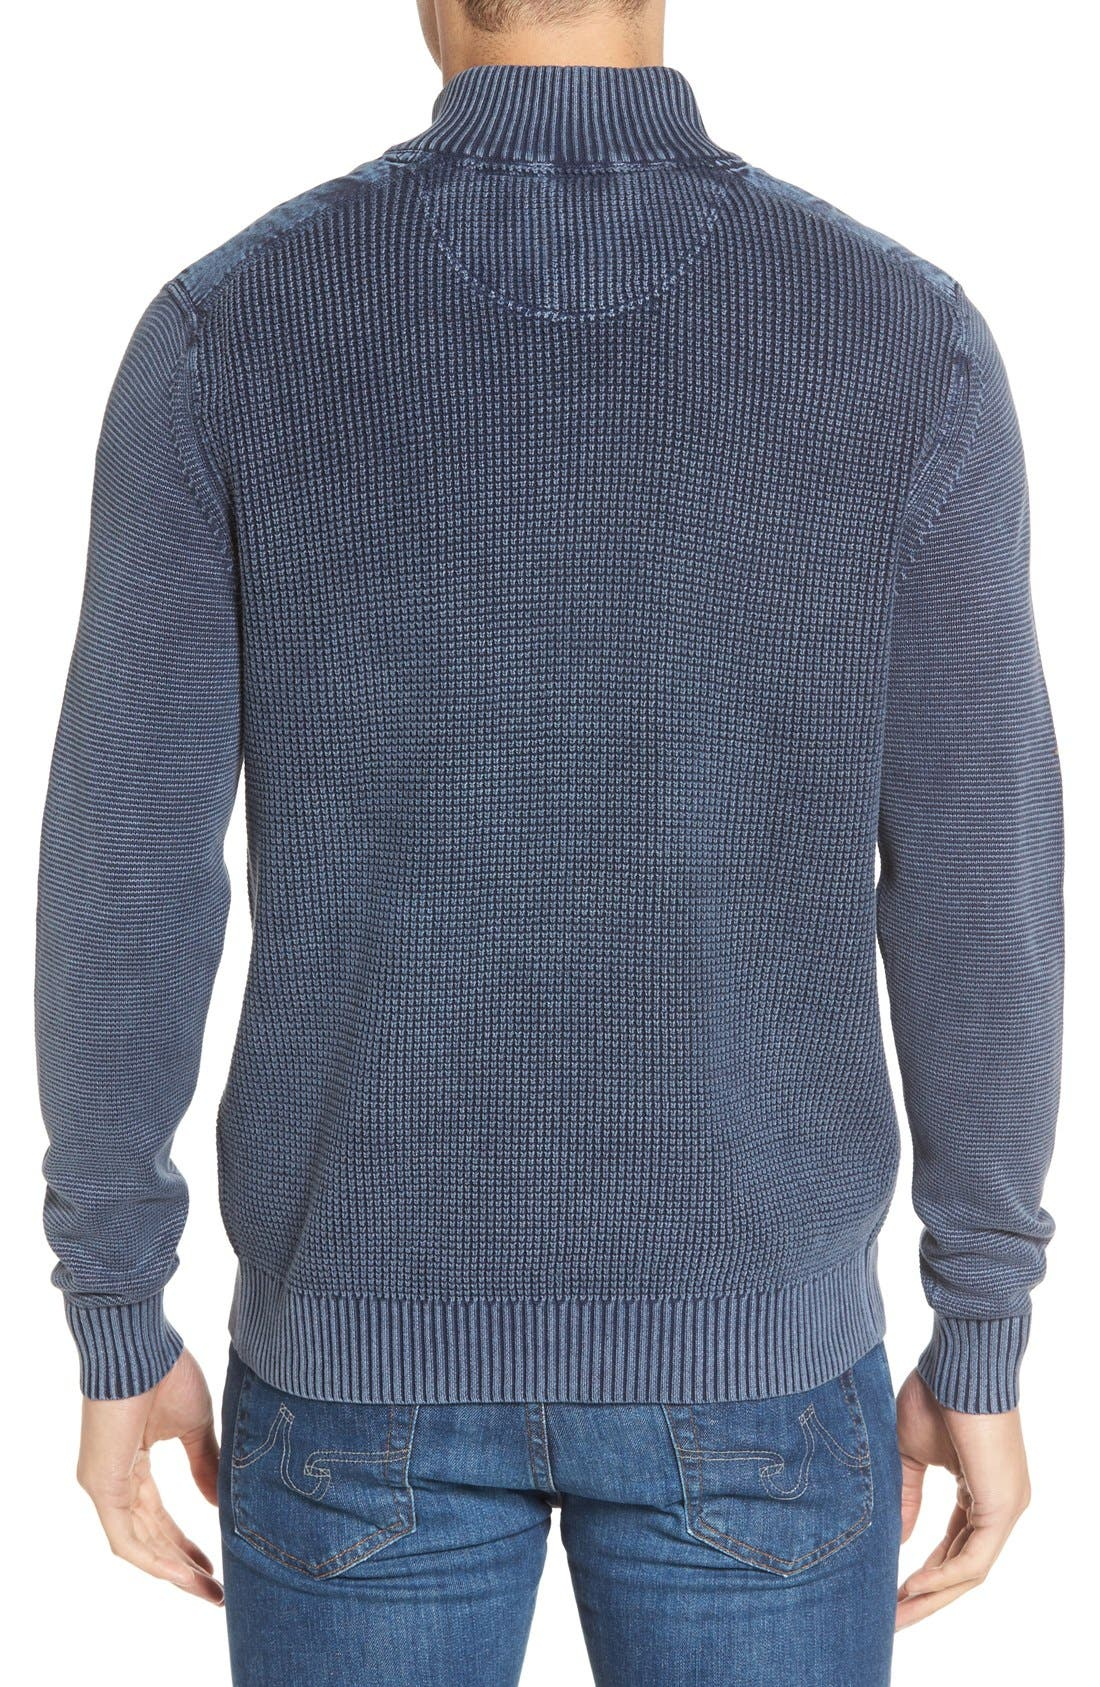 'Coastal Shores' Quarter Zip Sweater,                             Alternate thumbnail 18, color,